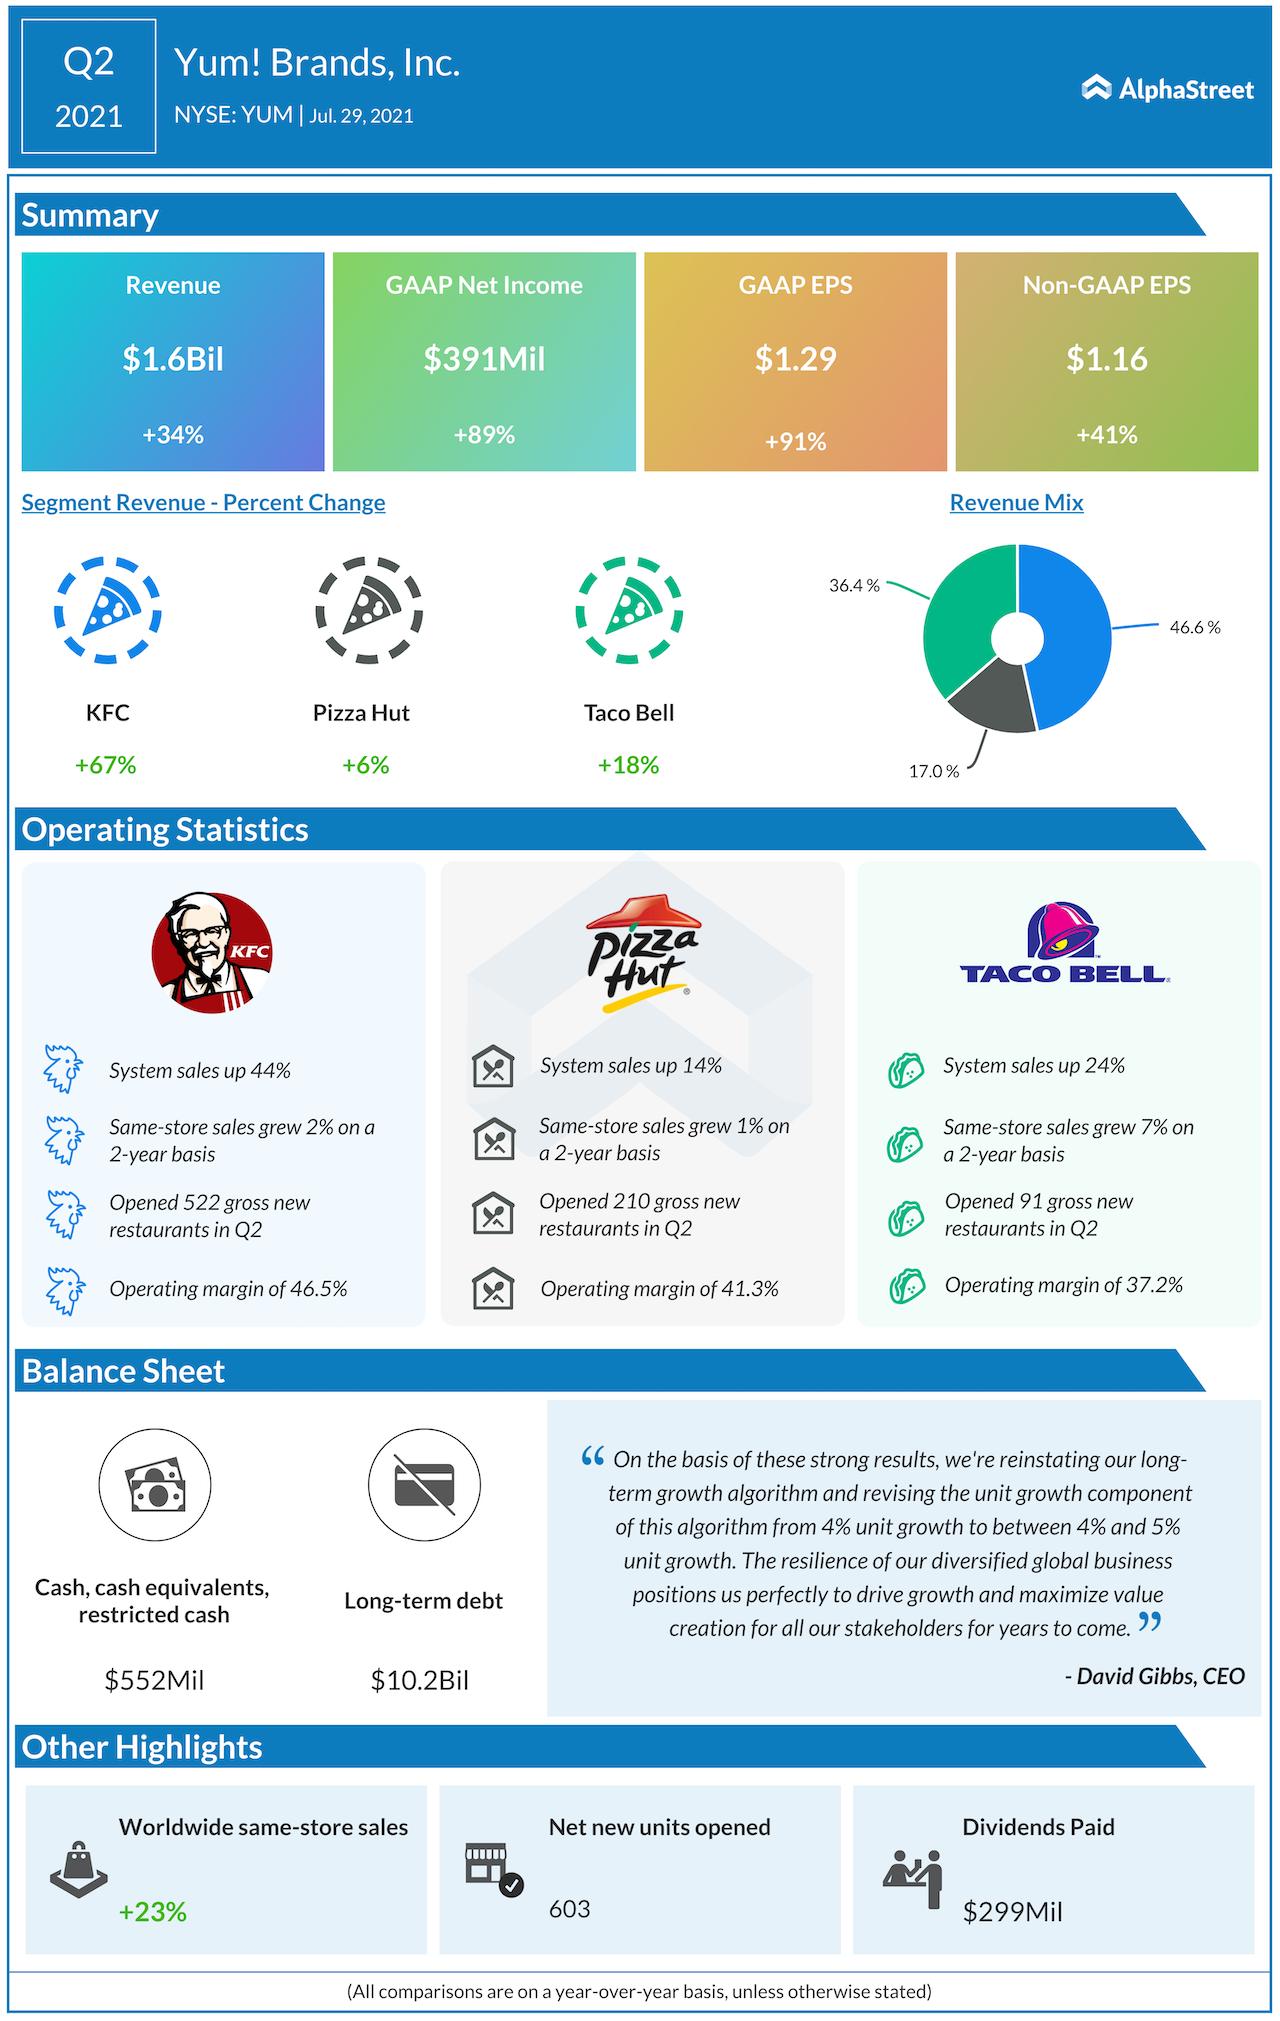 Yum Brands Q2 2021 earnings